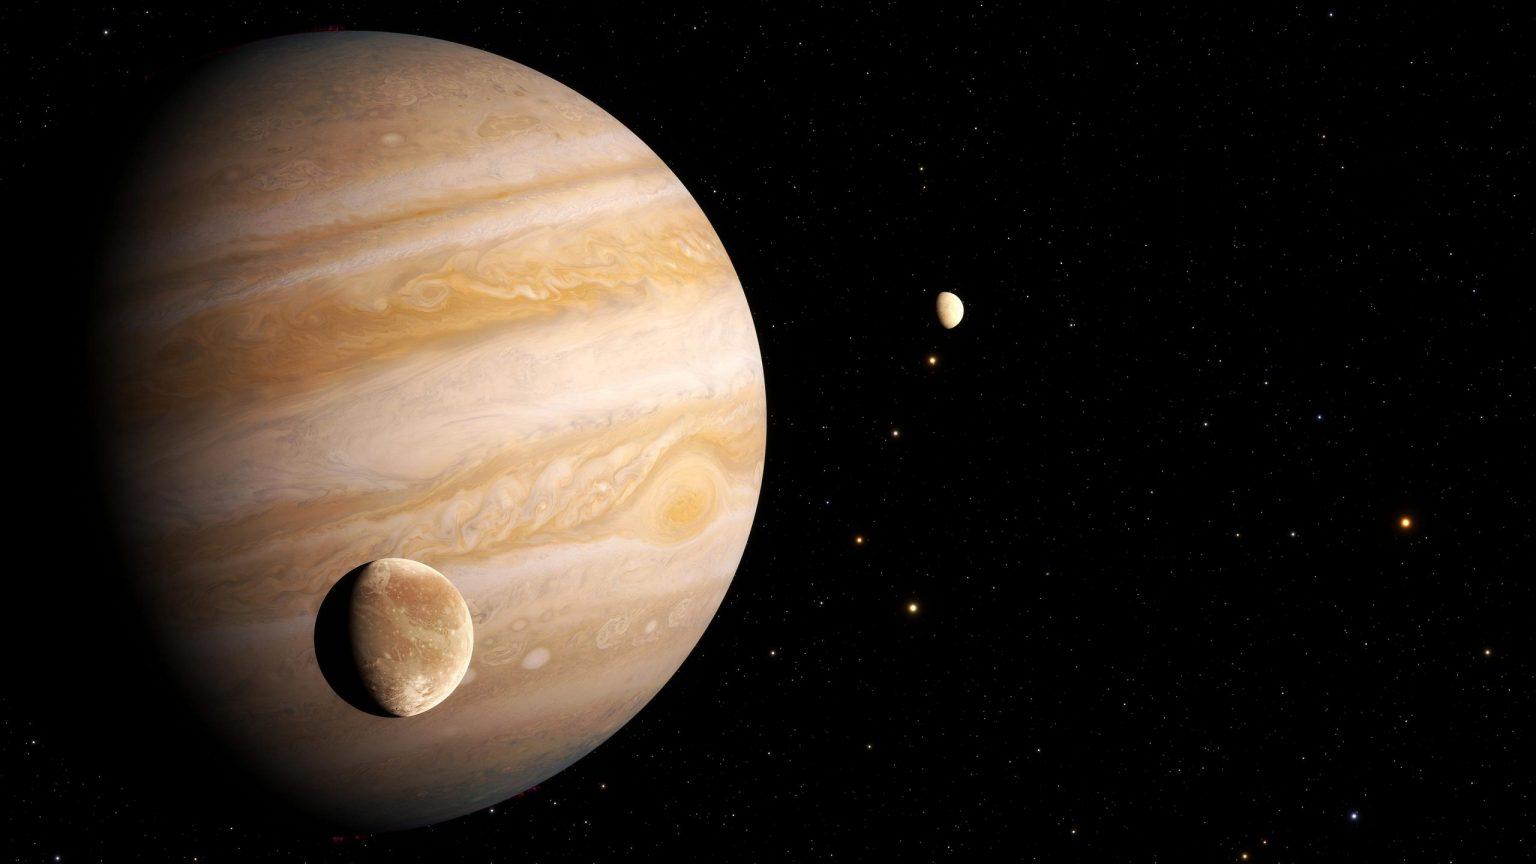 Hubble Finds Evidence of Water Vapor at Ganymede | হাবল গ্যানিমিডে জলীয় বাষ্পের প্রমাণ খুঁজে পেয়েছে_40.1